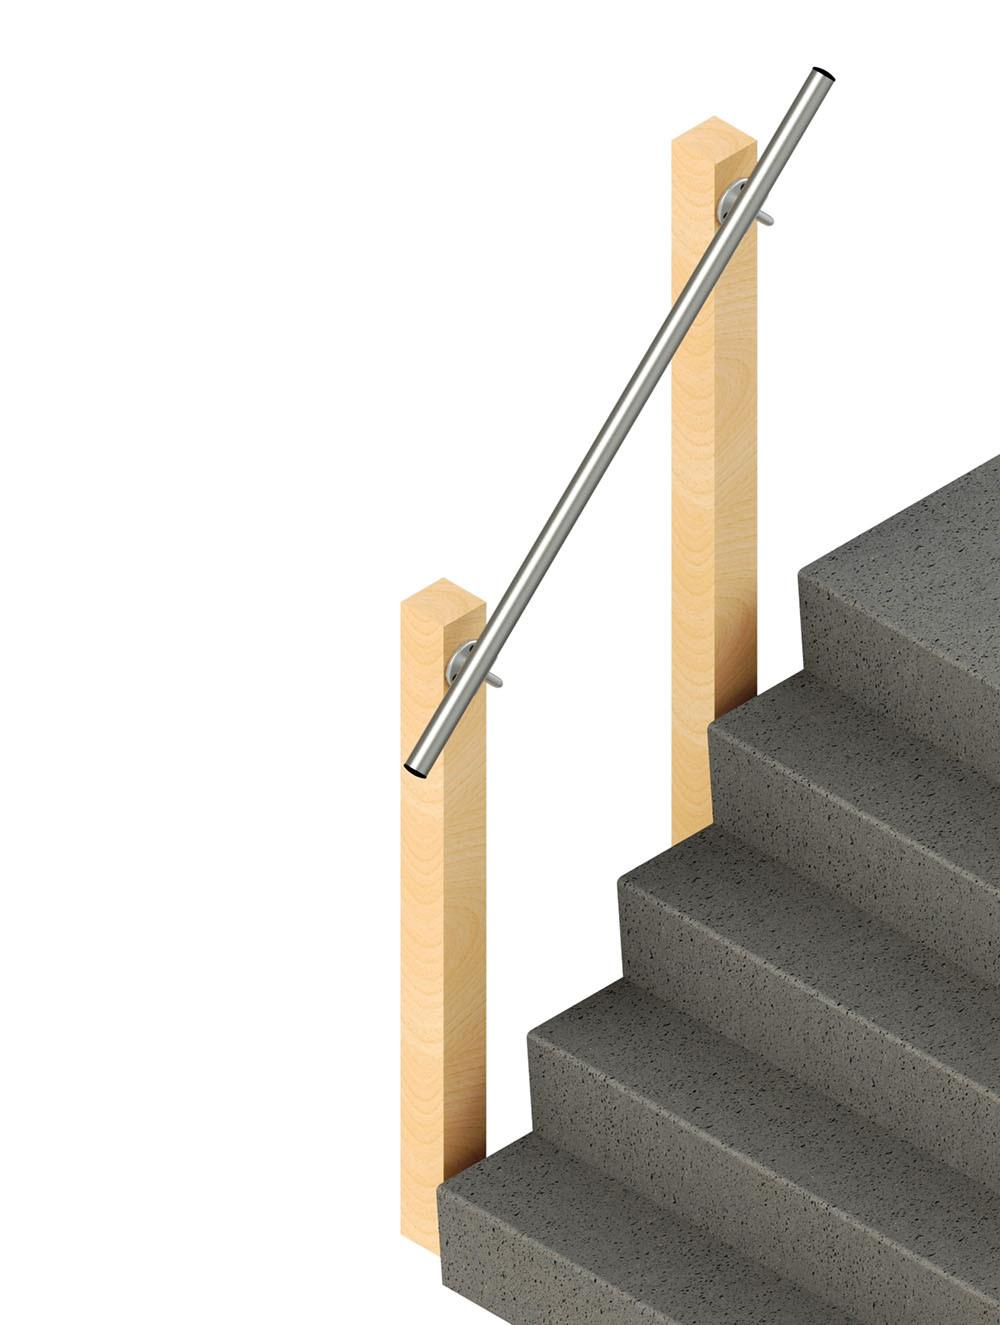 SR-570 Wall Mounted Handrail, render